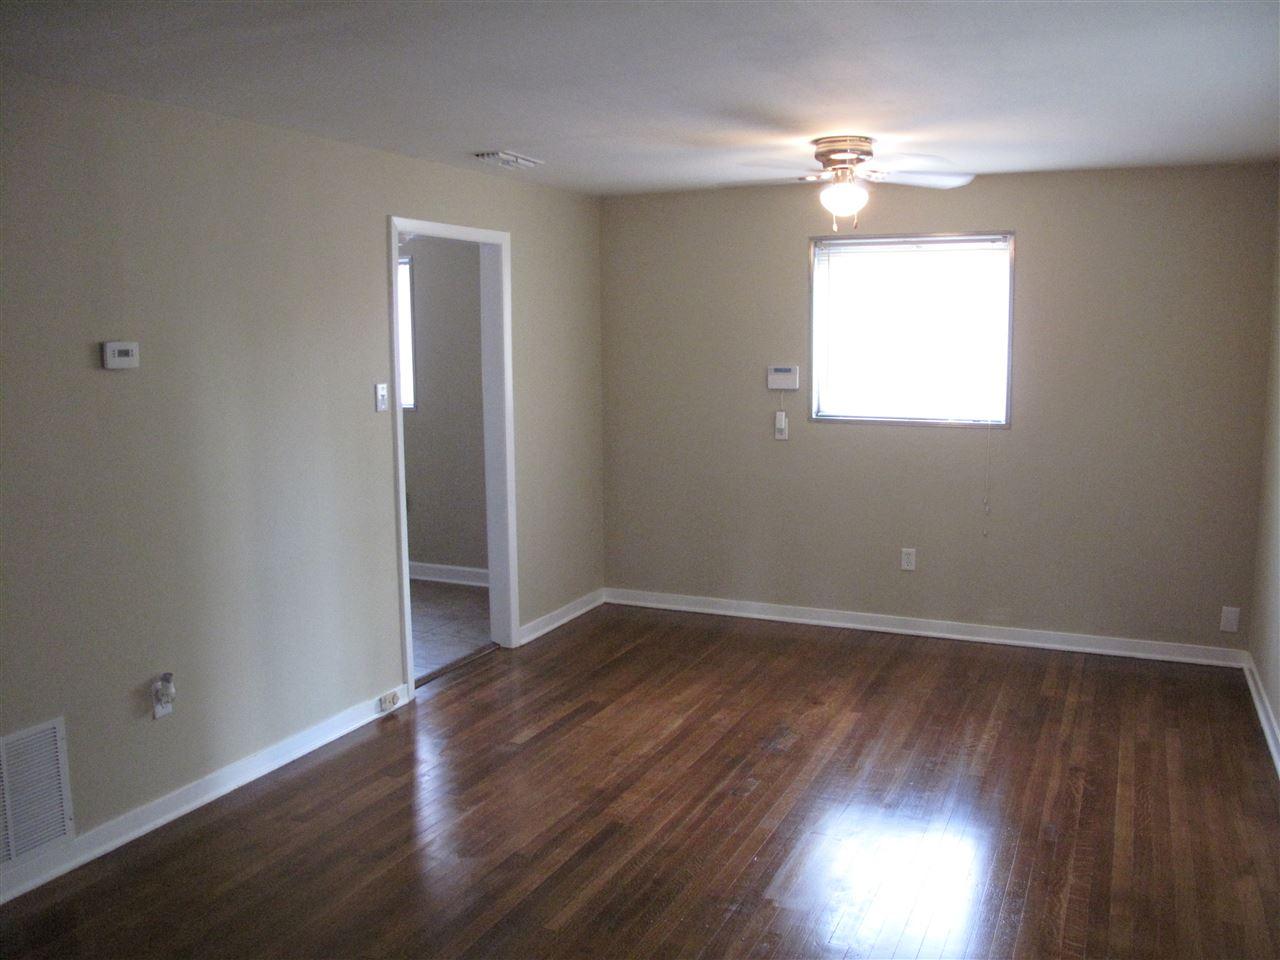 427 Malboro, Memphis, TN 38120